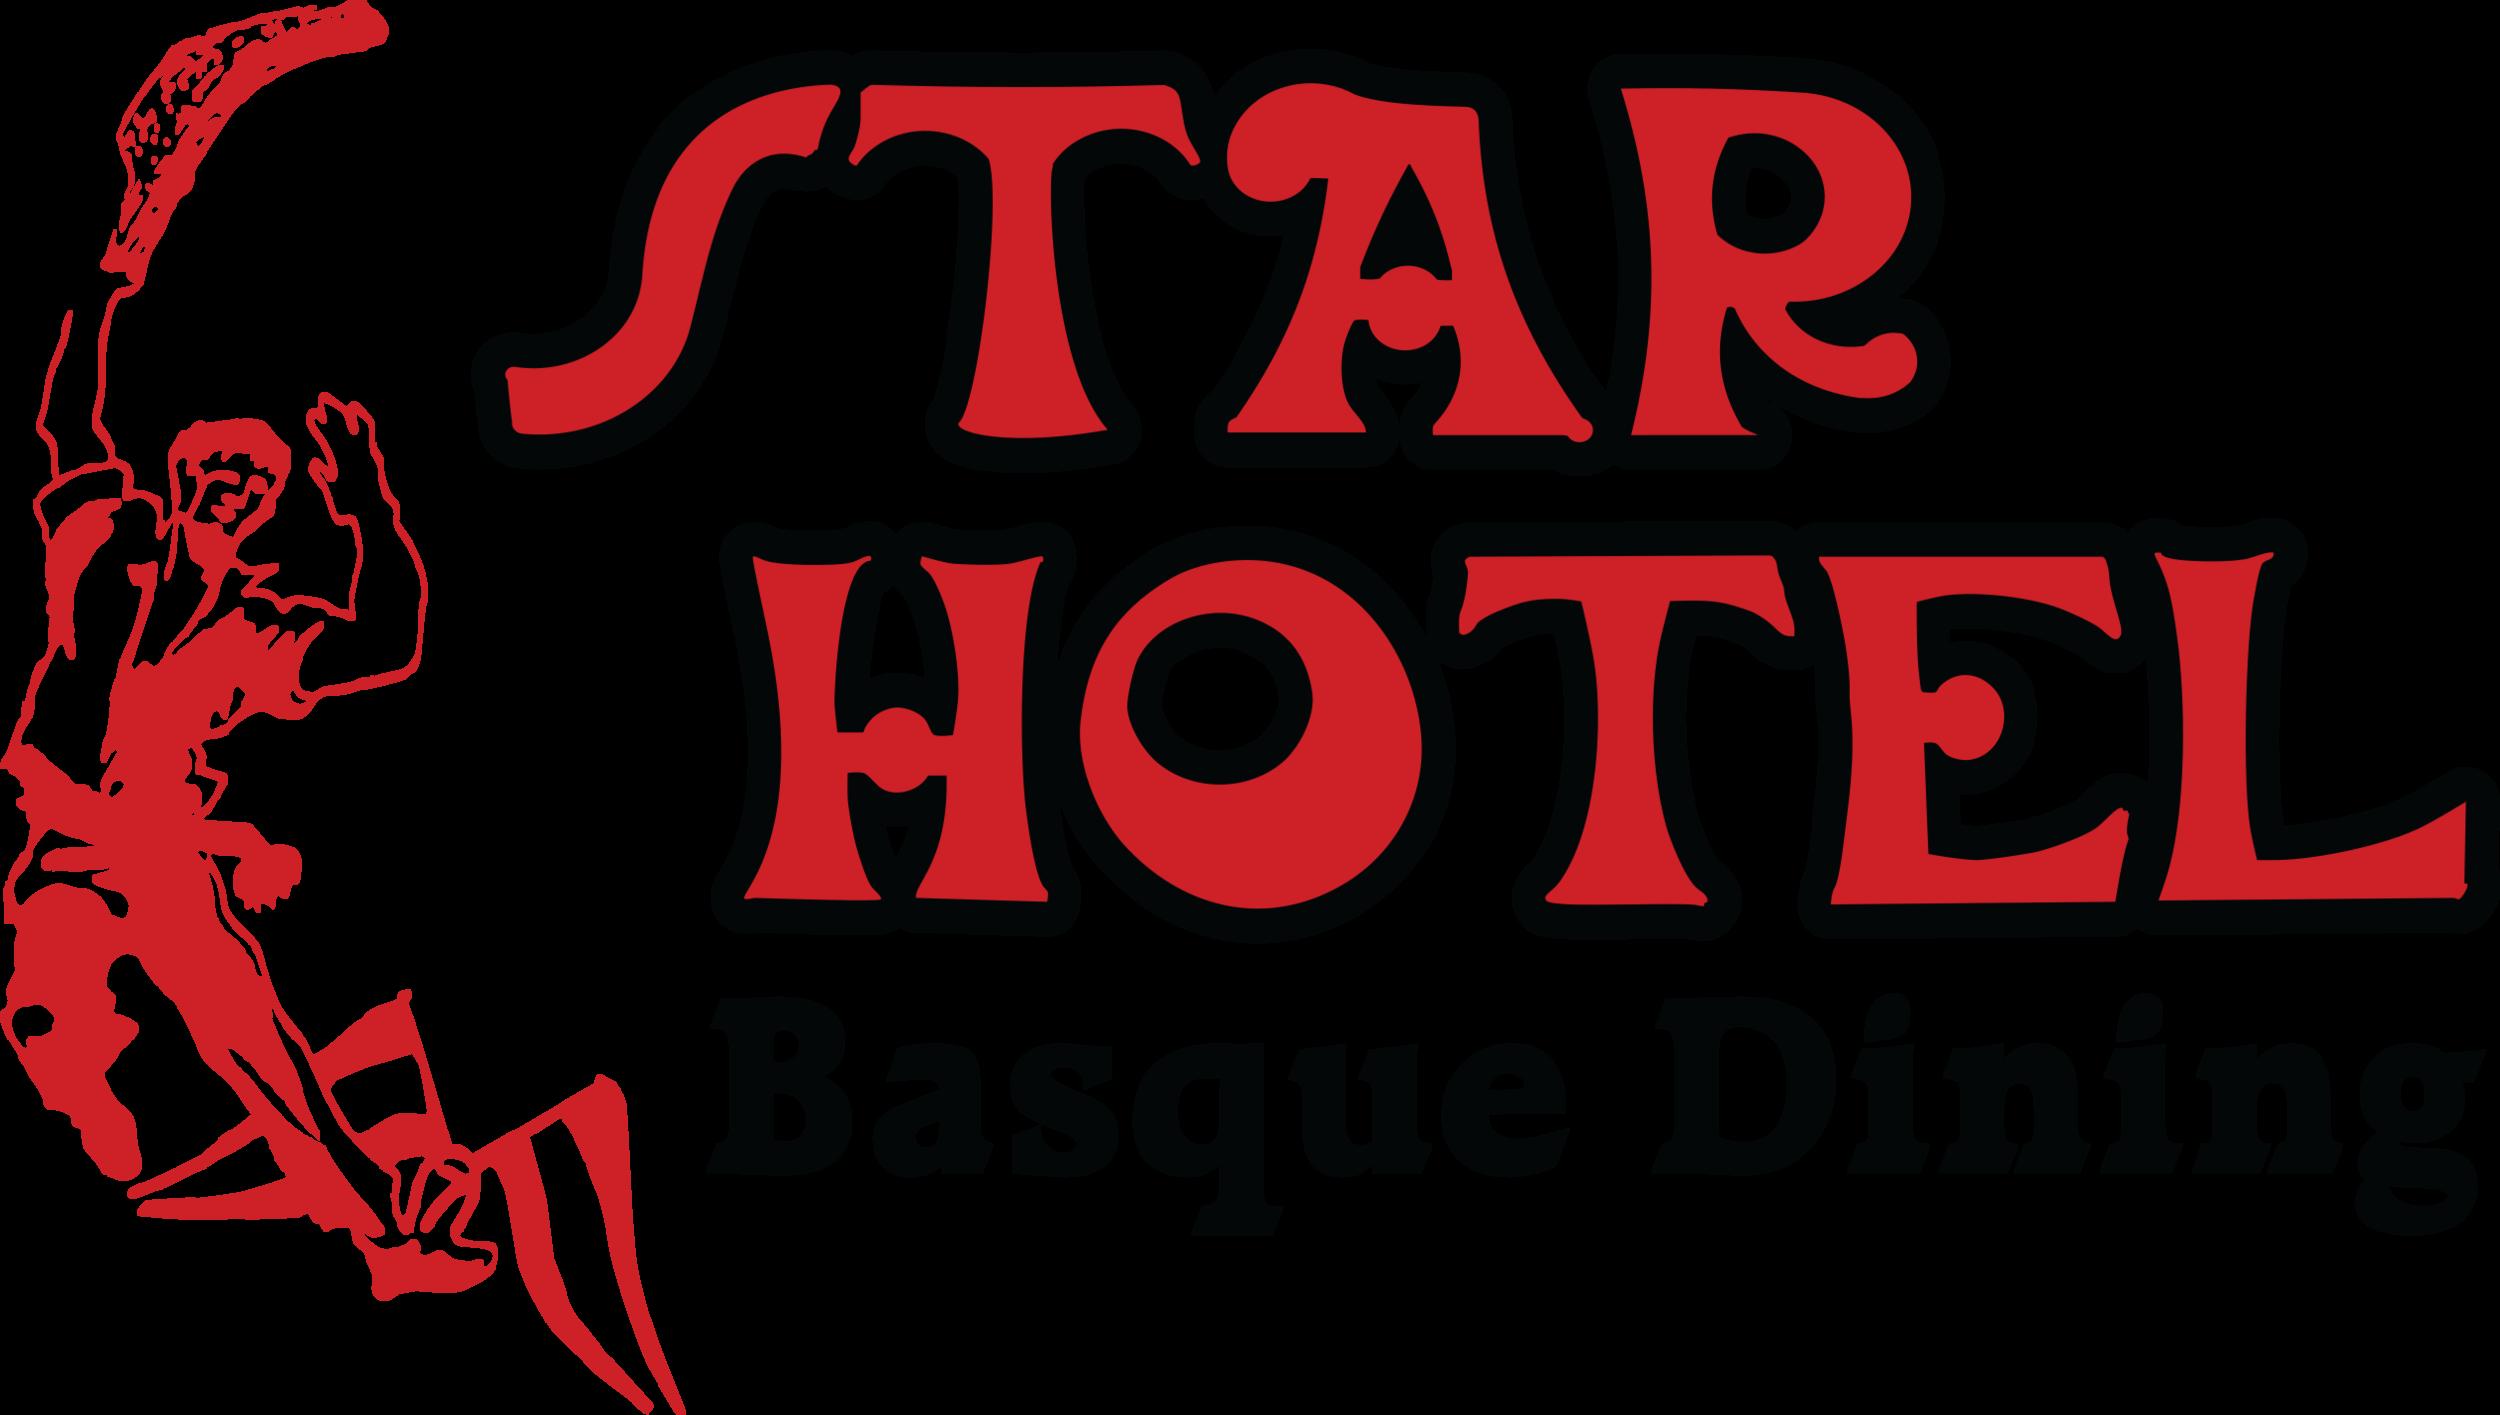 StarHotel.png